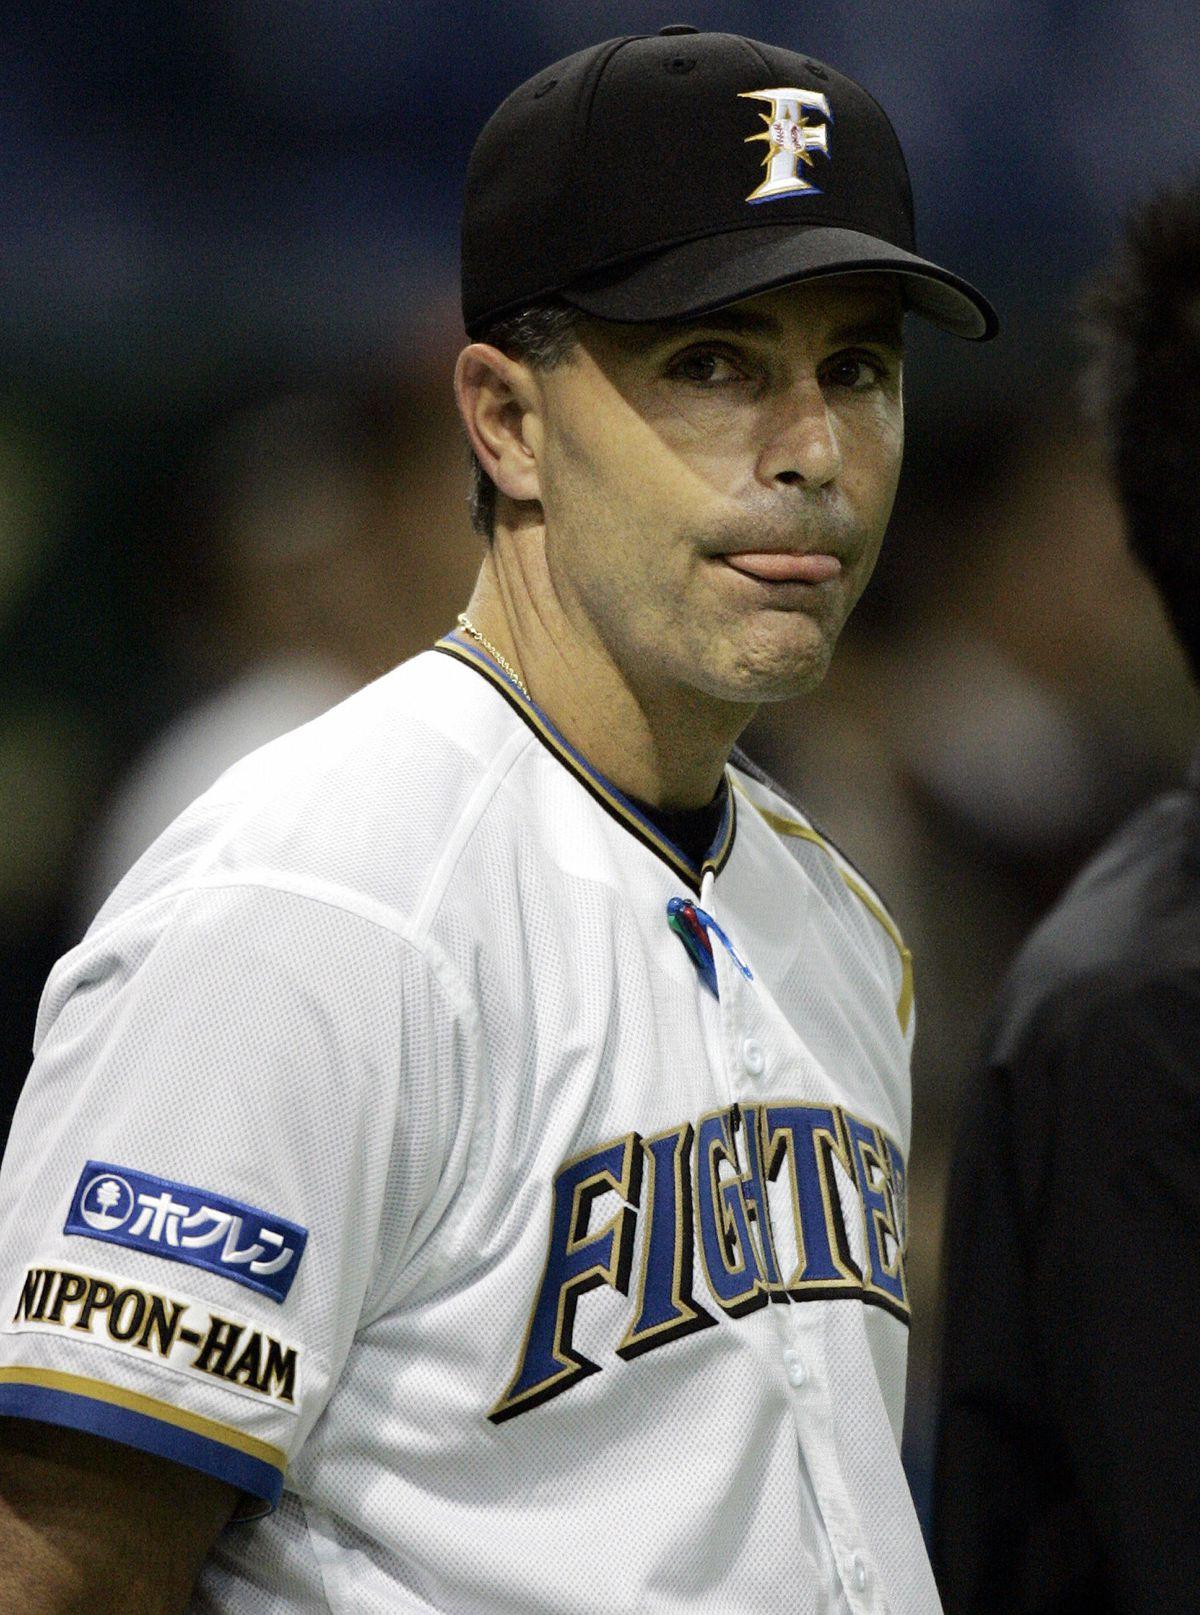 Japanese baseball team Nippon Ham Fighters